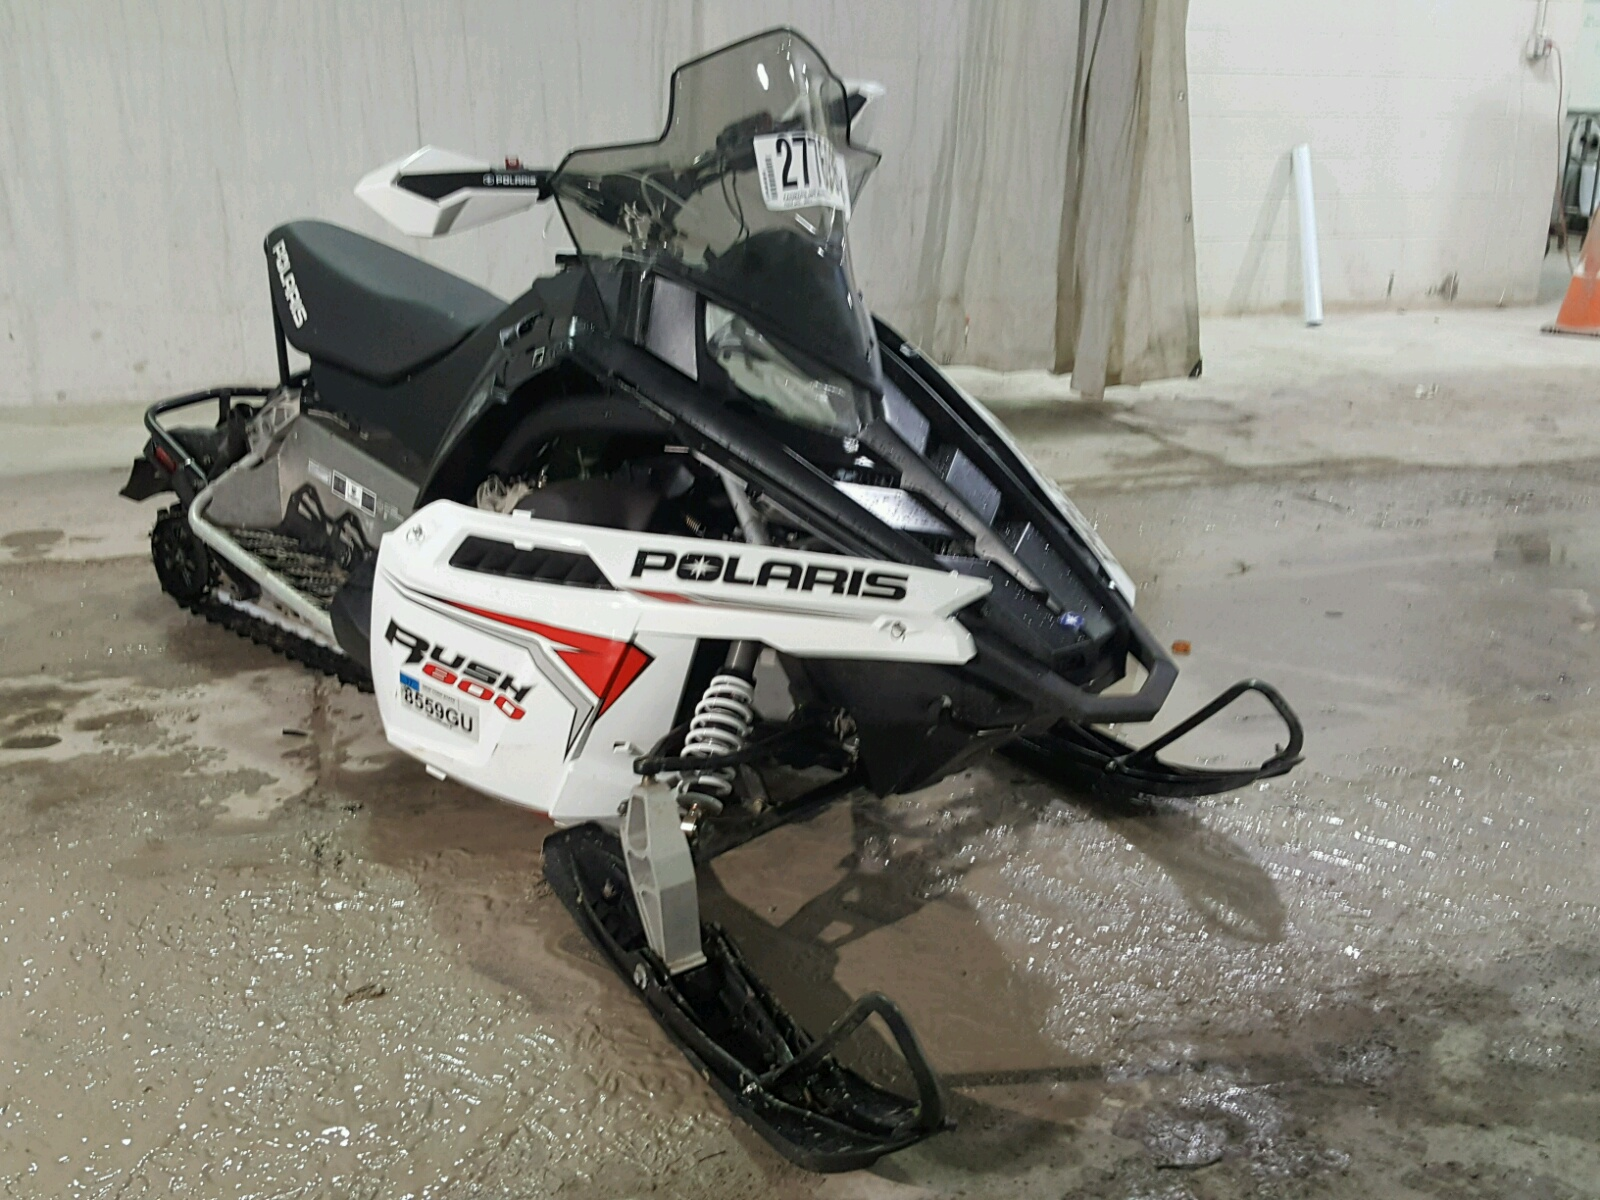 2012 POLA 800 RUSH